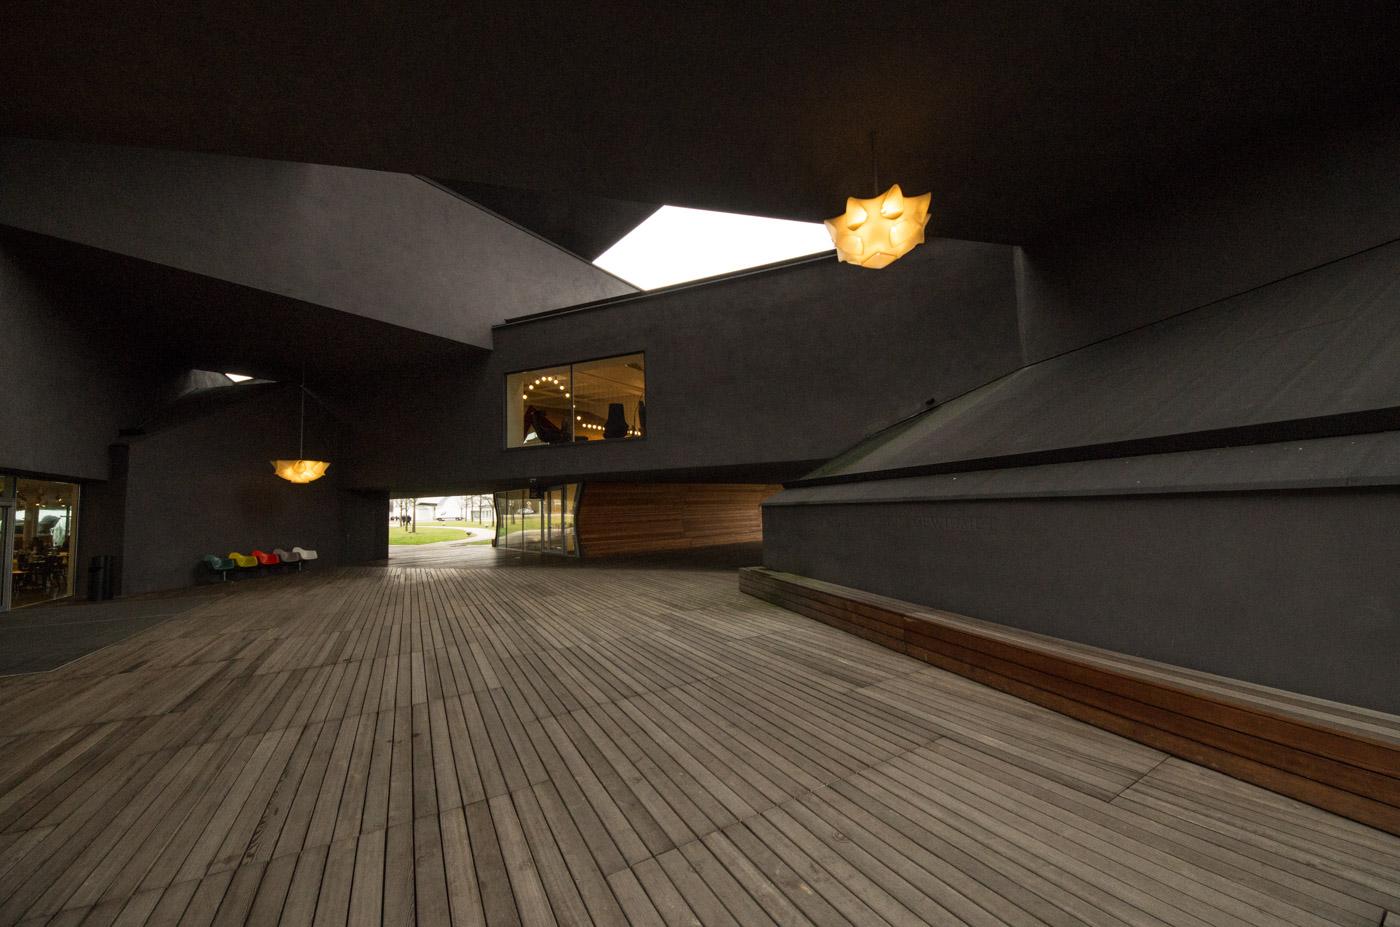 vitra-design-weil-am-rhein-4785